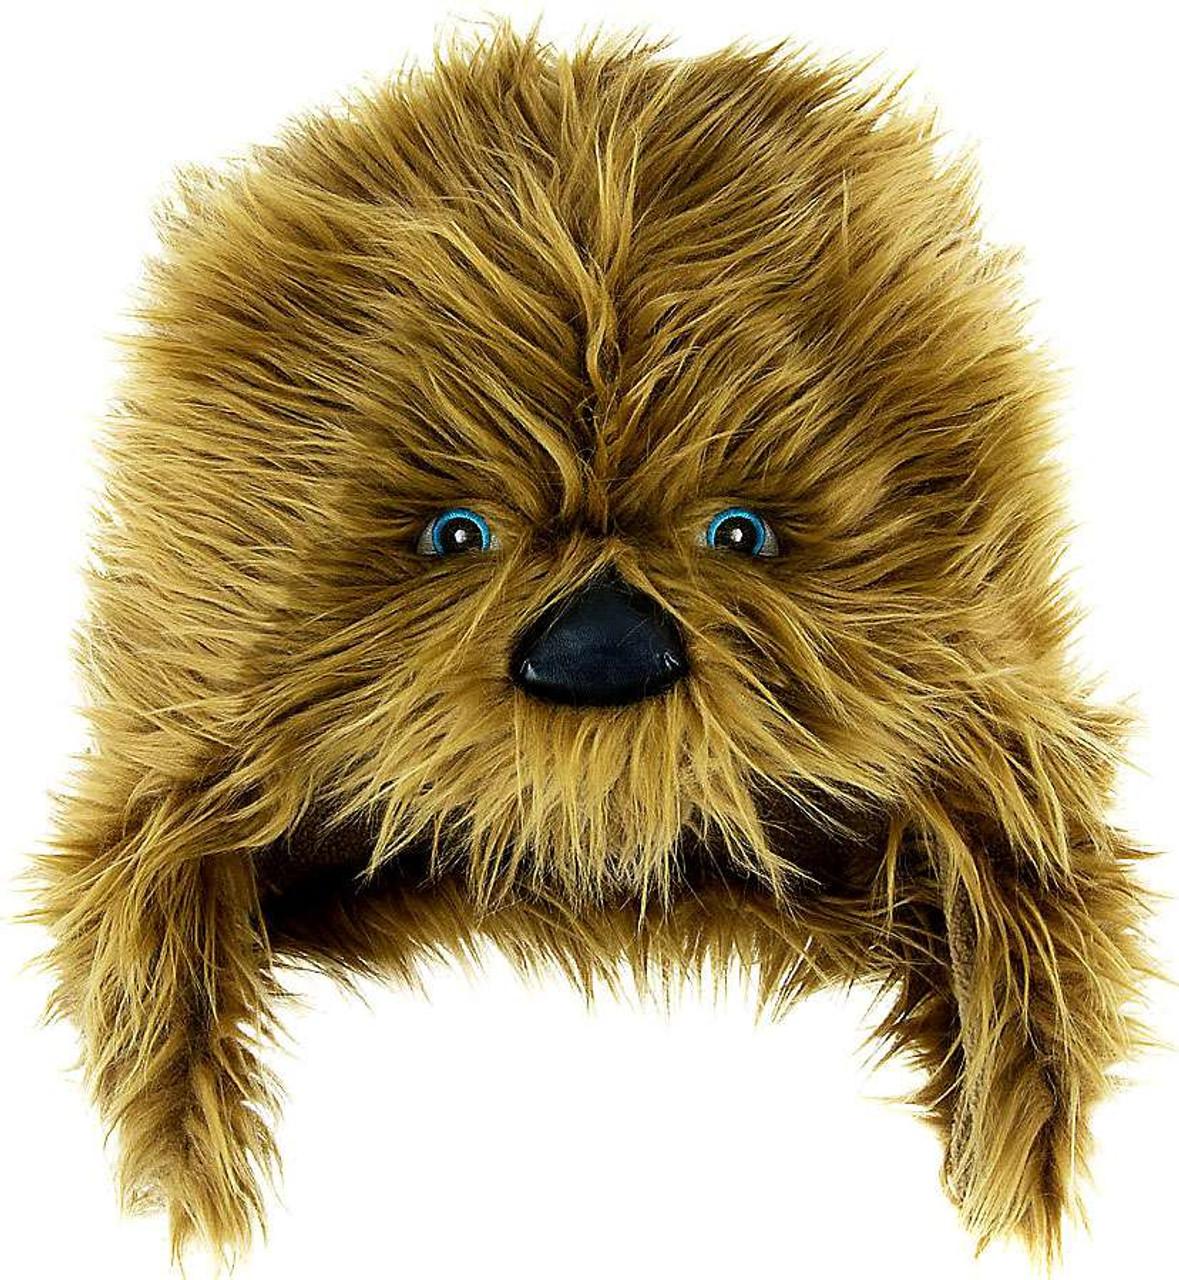 cc77ee85c74 Disney Star Wars Chewbacca Hat Exclusive Apparel - ToyWiz